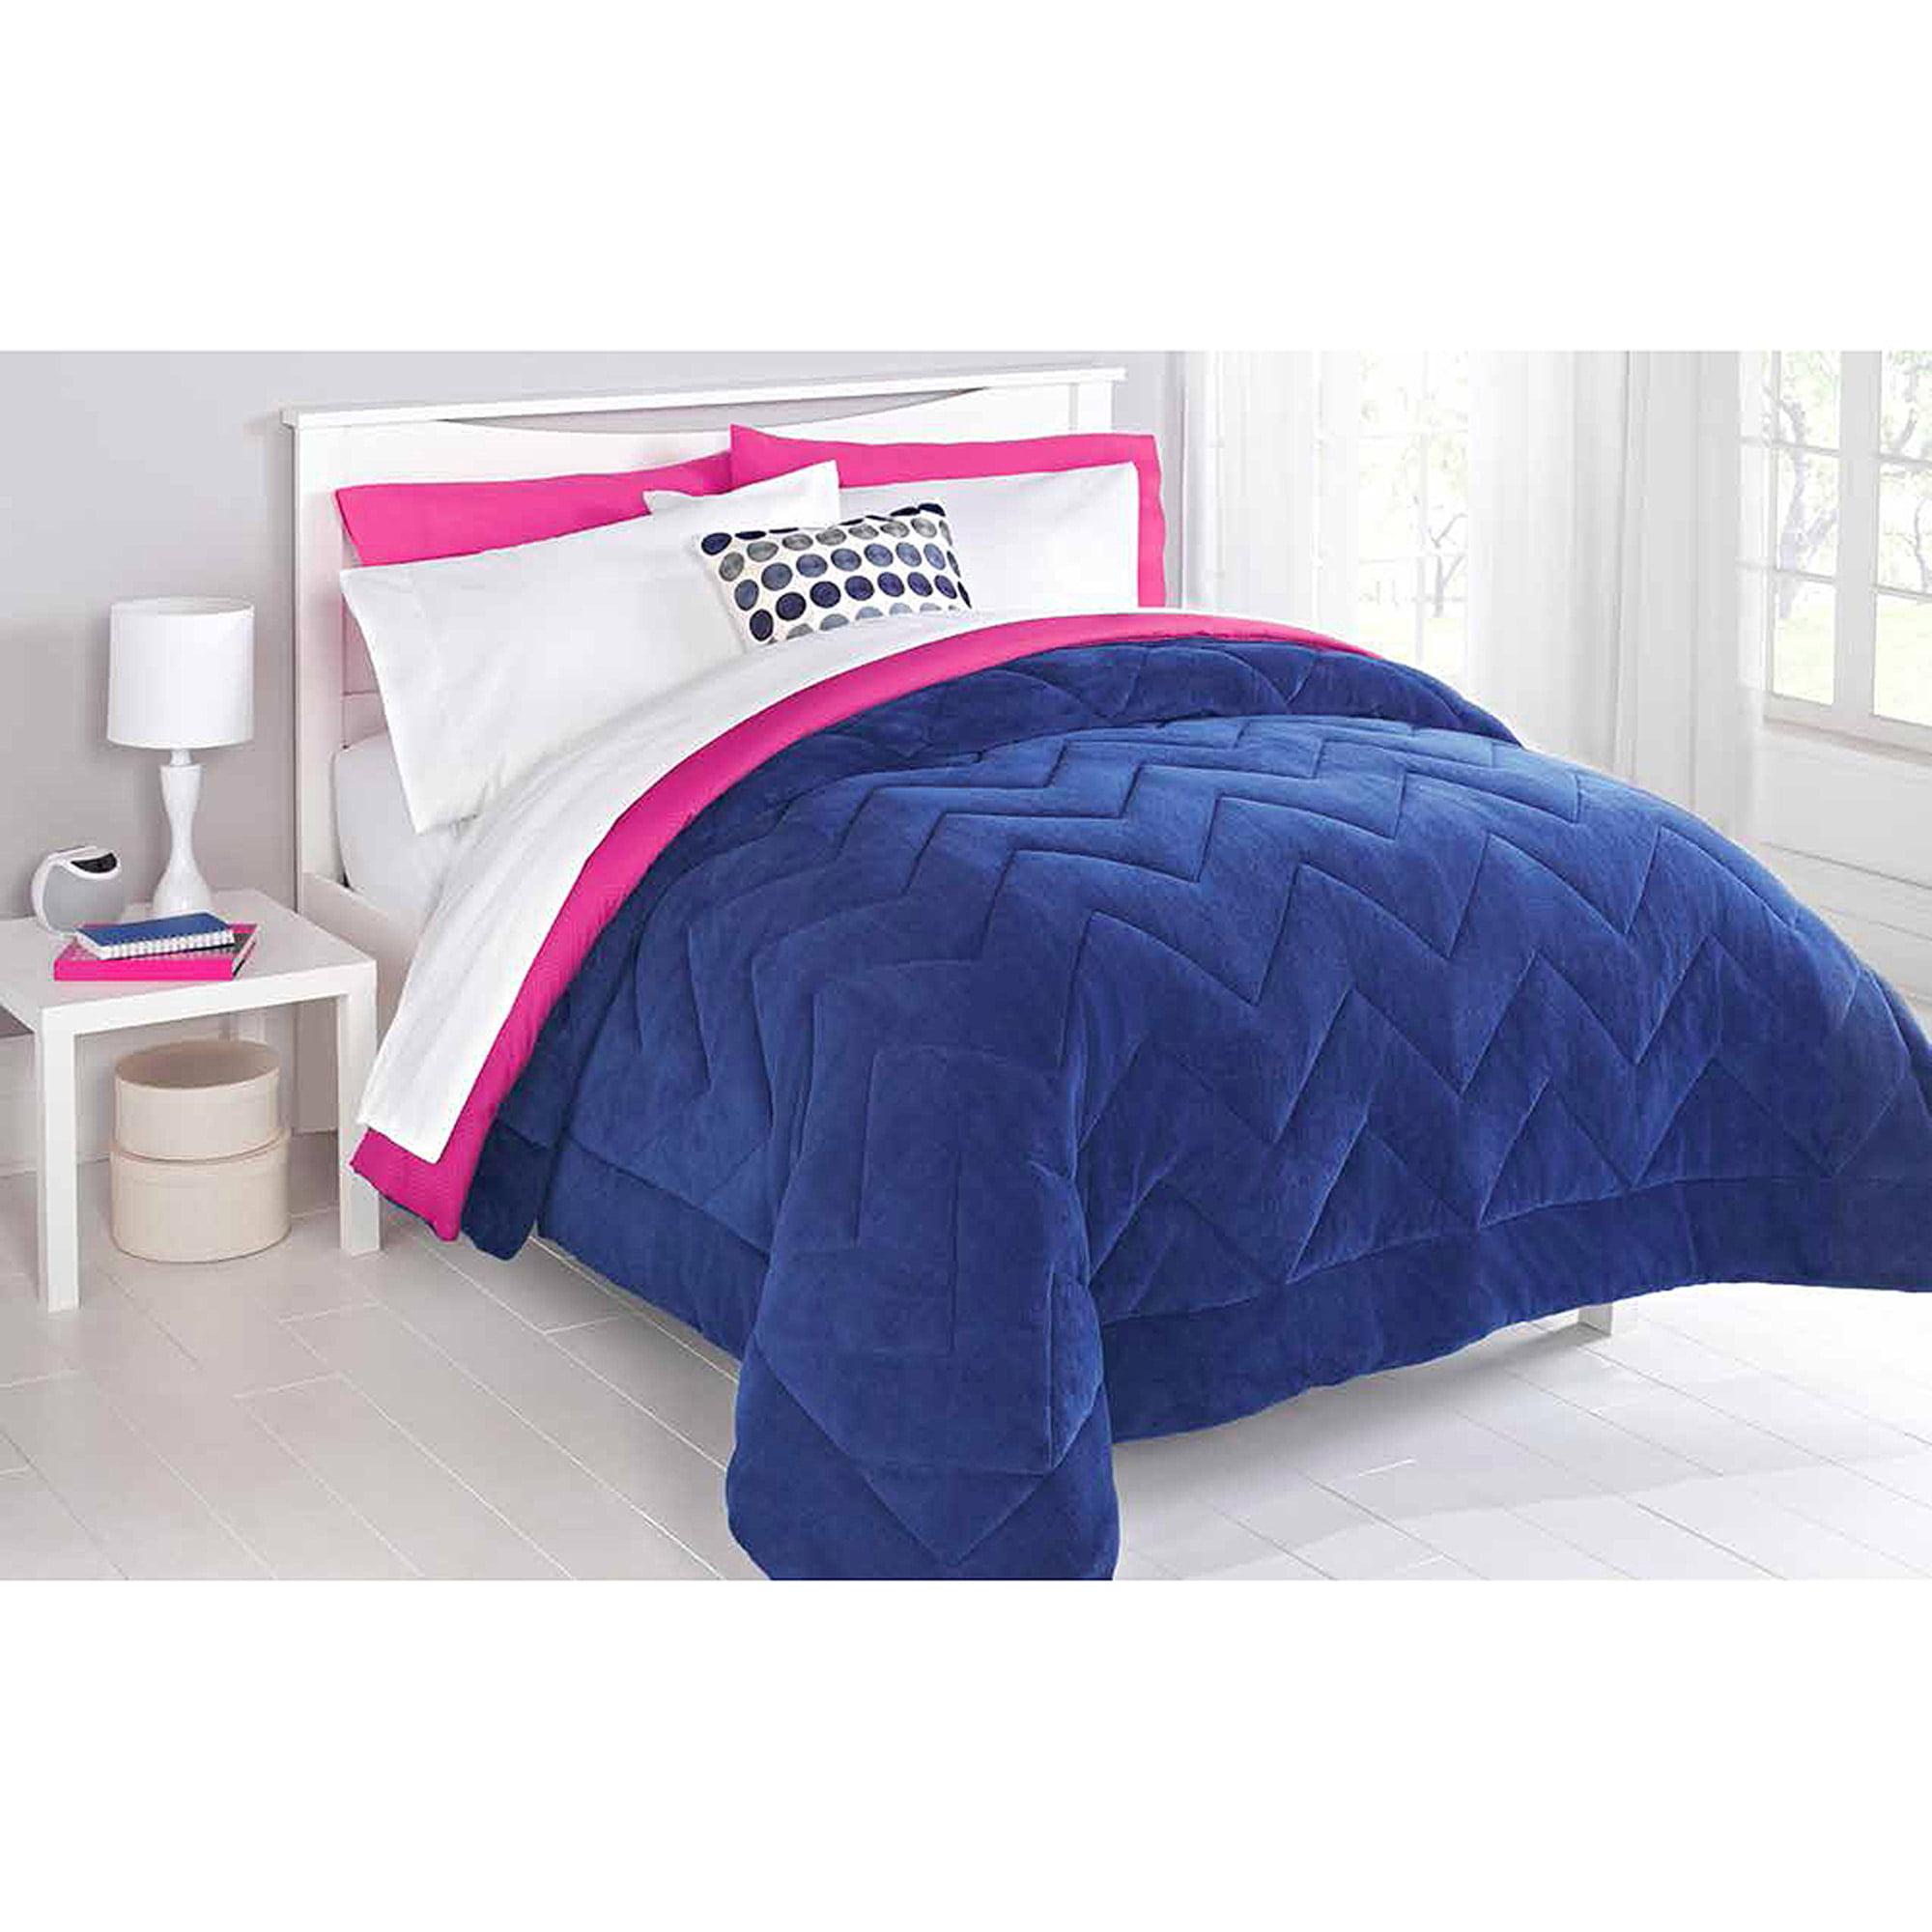 Mainstays Reversible Plush Comforter